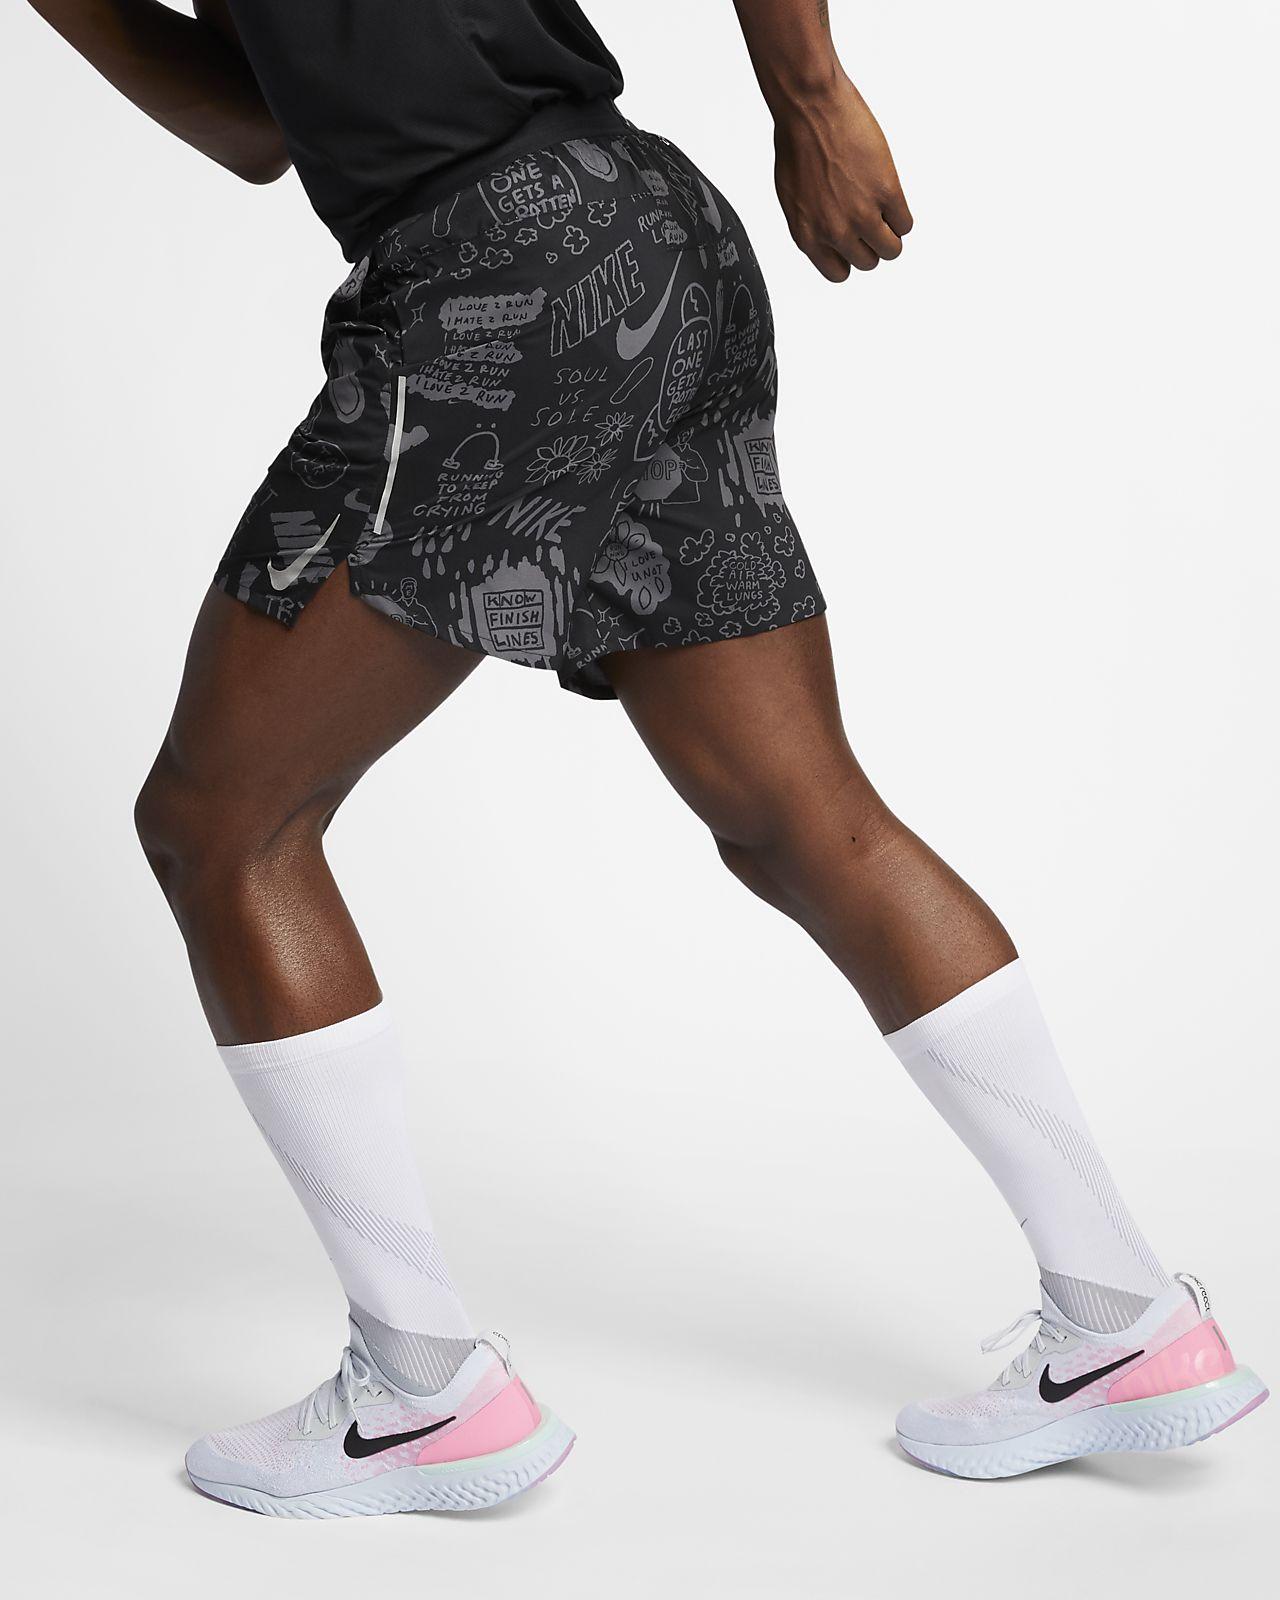 570f1d5e6cc Nike Flex Stride Nathan Bell Men s 7